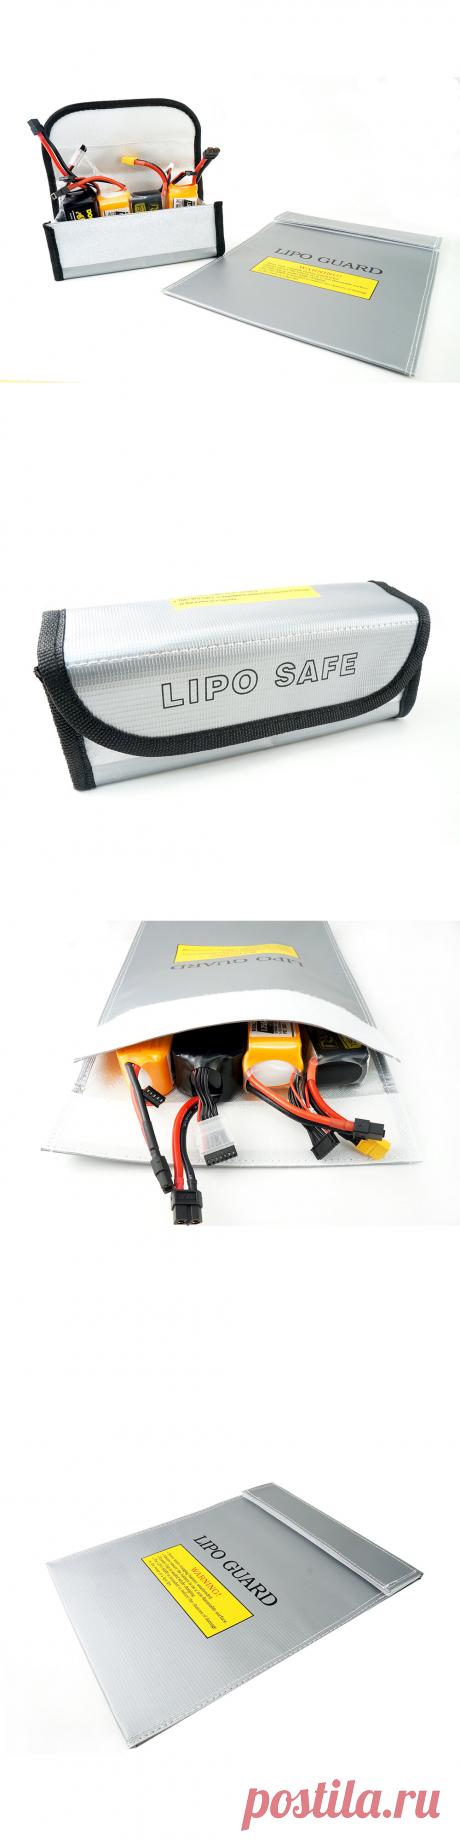 happymodel explosion-proof fireproof safe storage bag 85*75*65/230*300mm for rc lipo battery Sale - Banggood.com